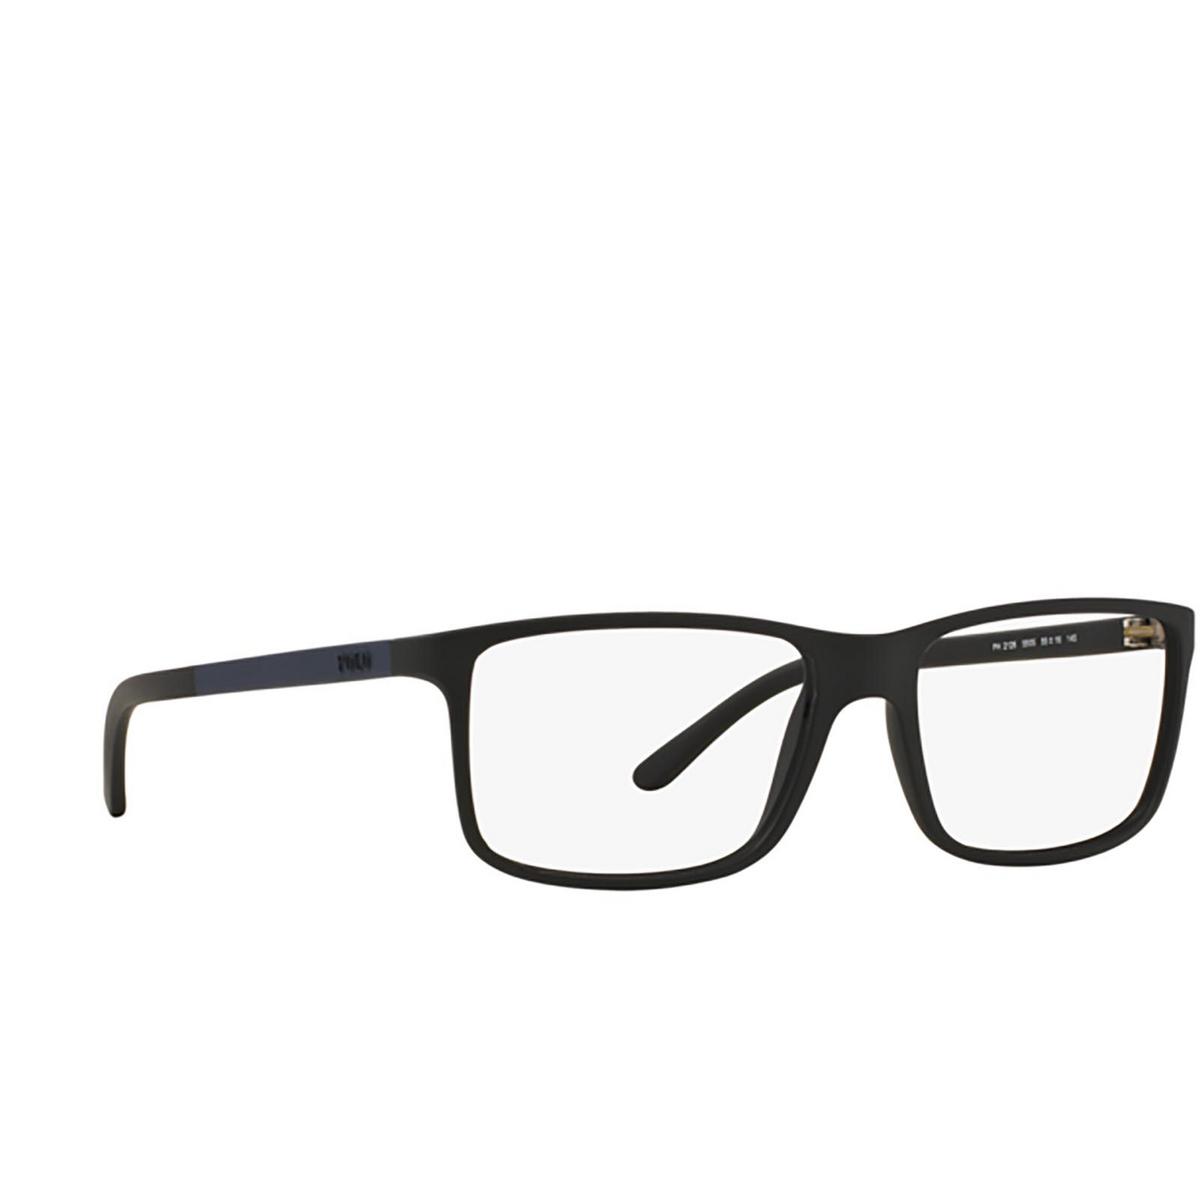 Polo Ralph Lauren® Rectangle Eyeglasses: PH2126 color Matte Black 5505 - three-quarters view.